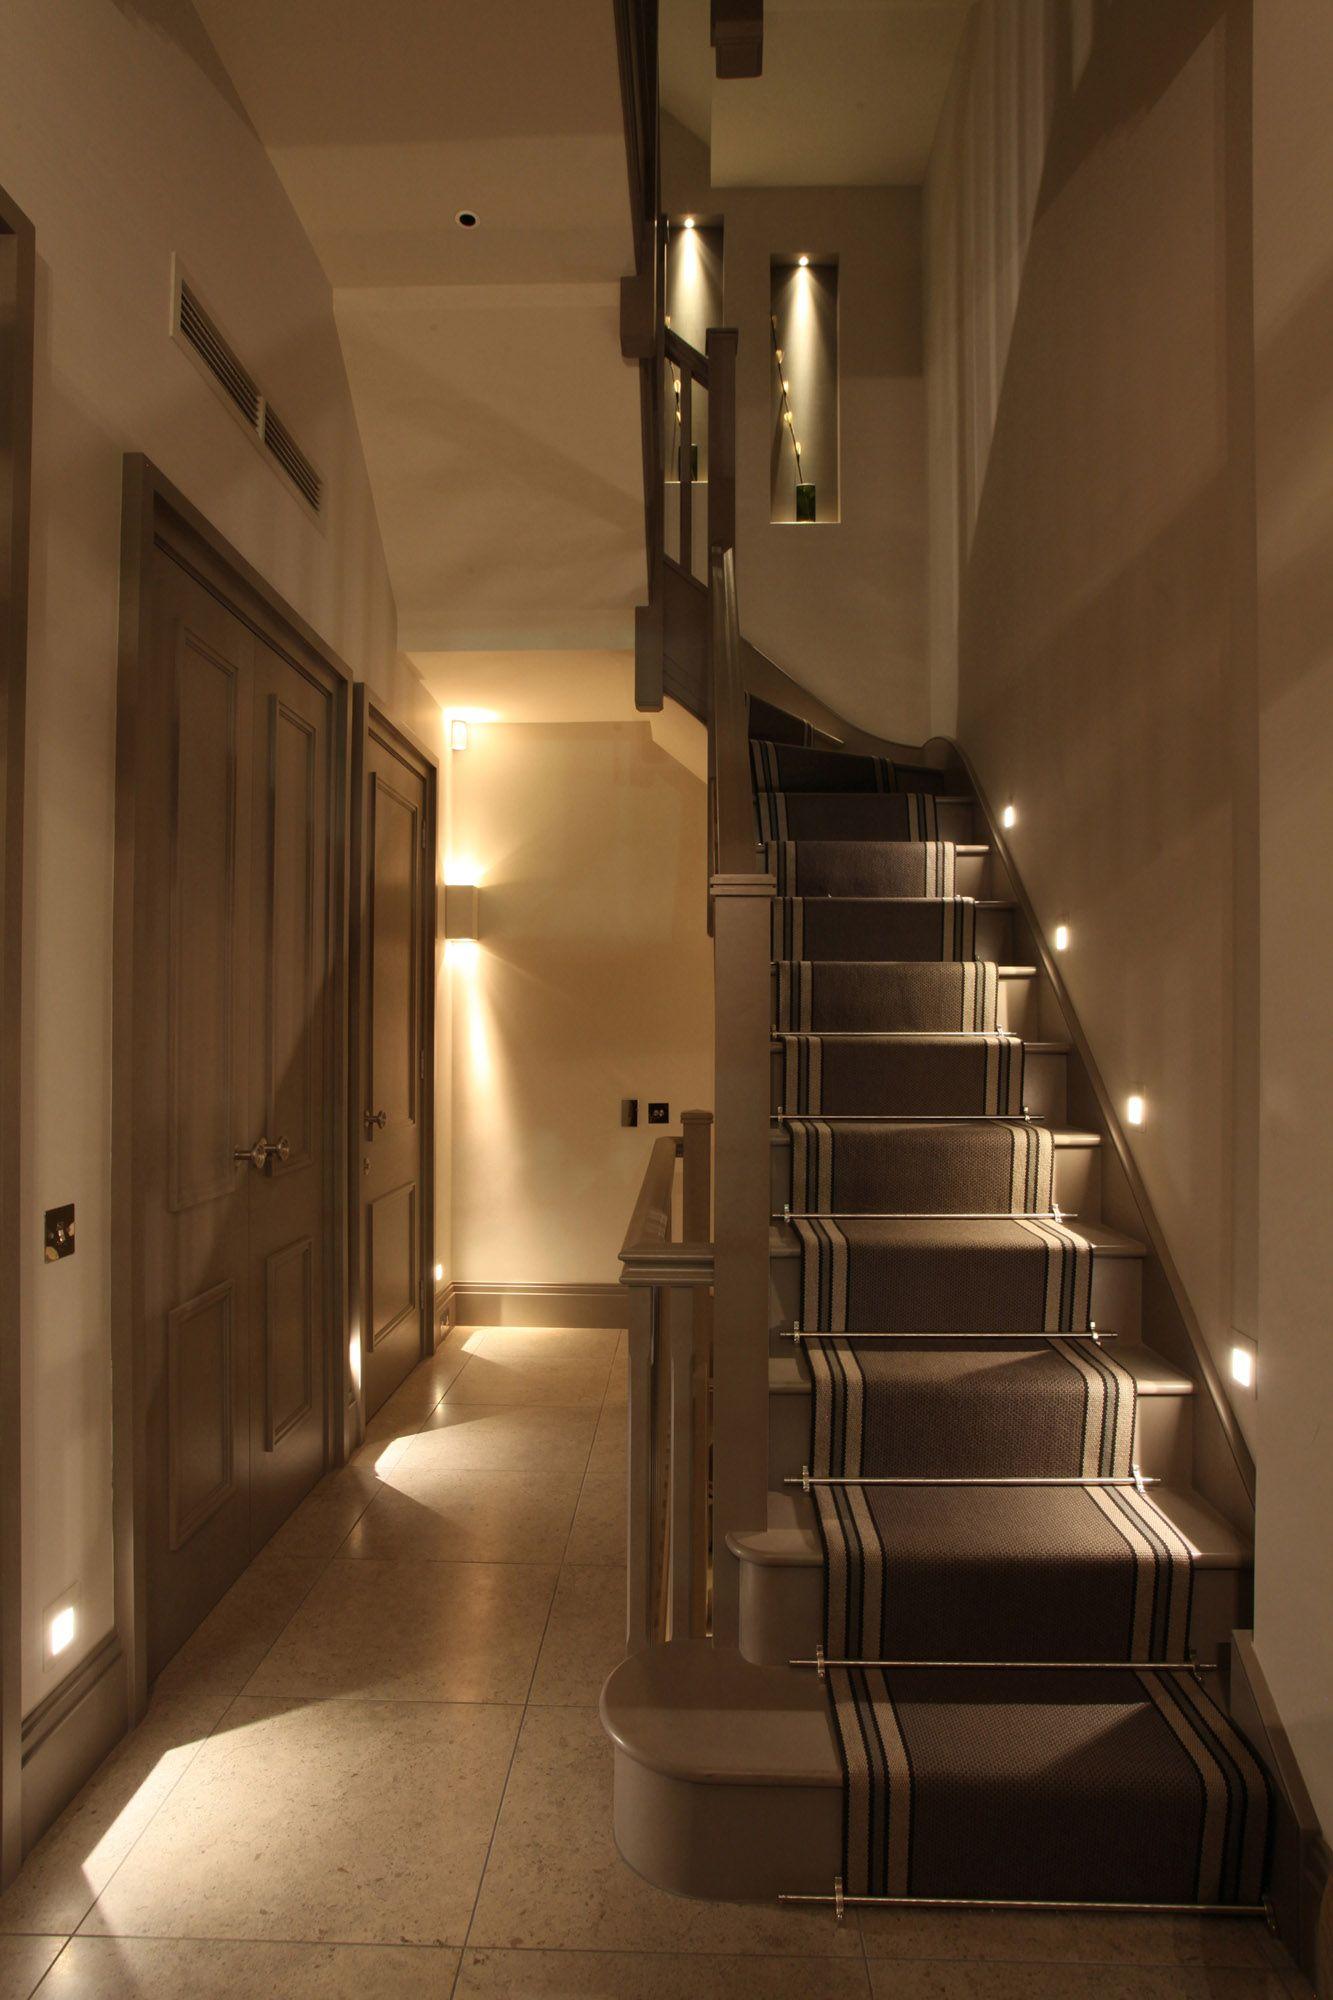 Hallway lighting pinterest Wall Hallway Lighting 26 Pinterest Hallway Lighting 26 Light The Way Pinterest Hallway Lighting